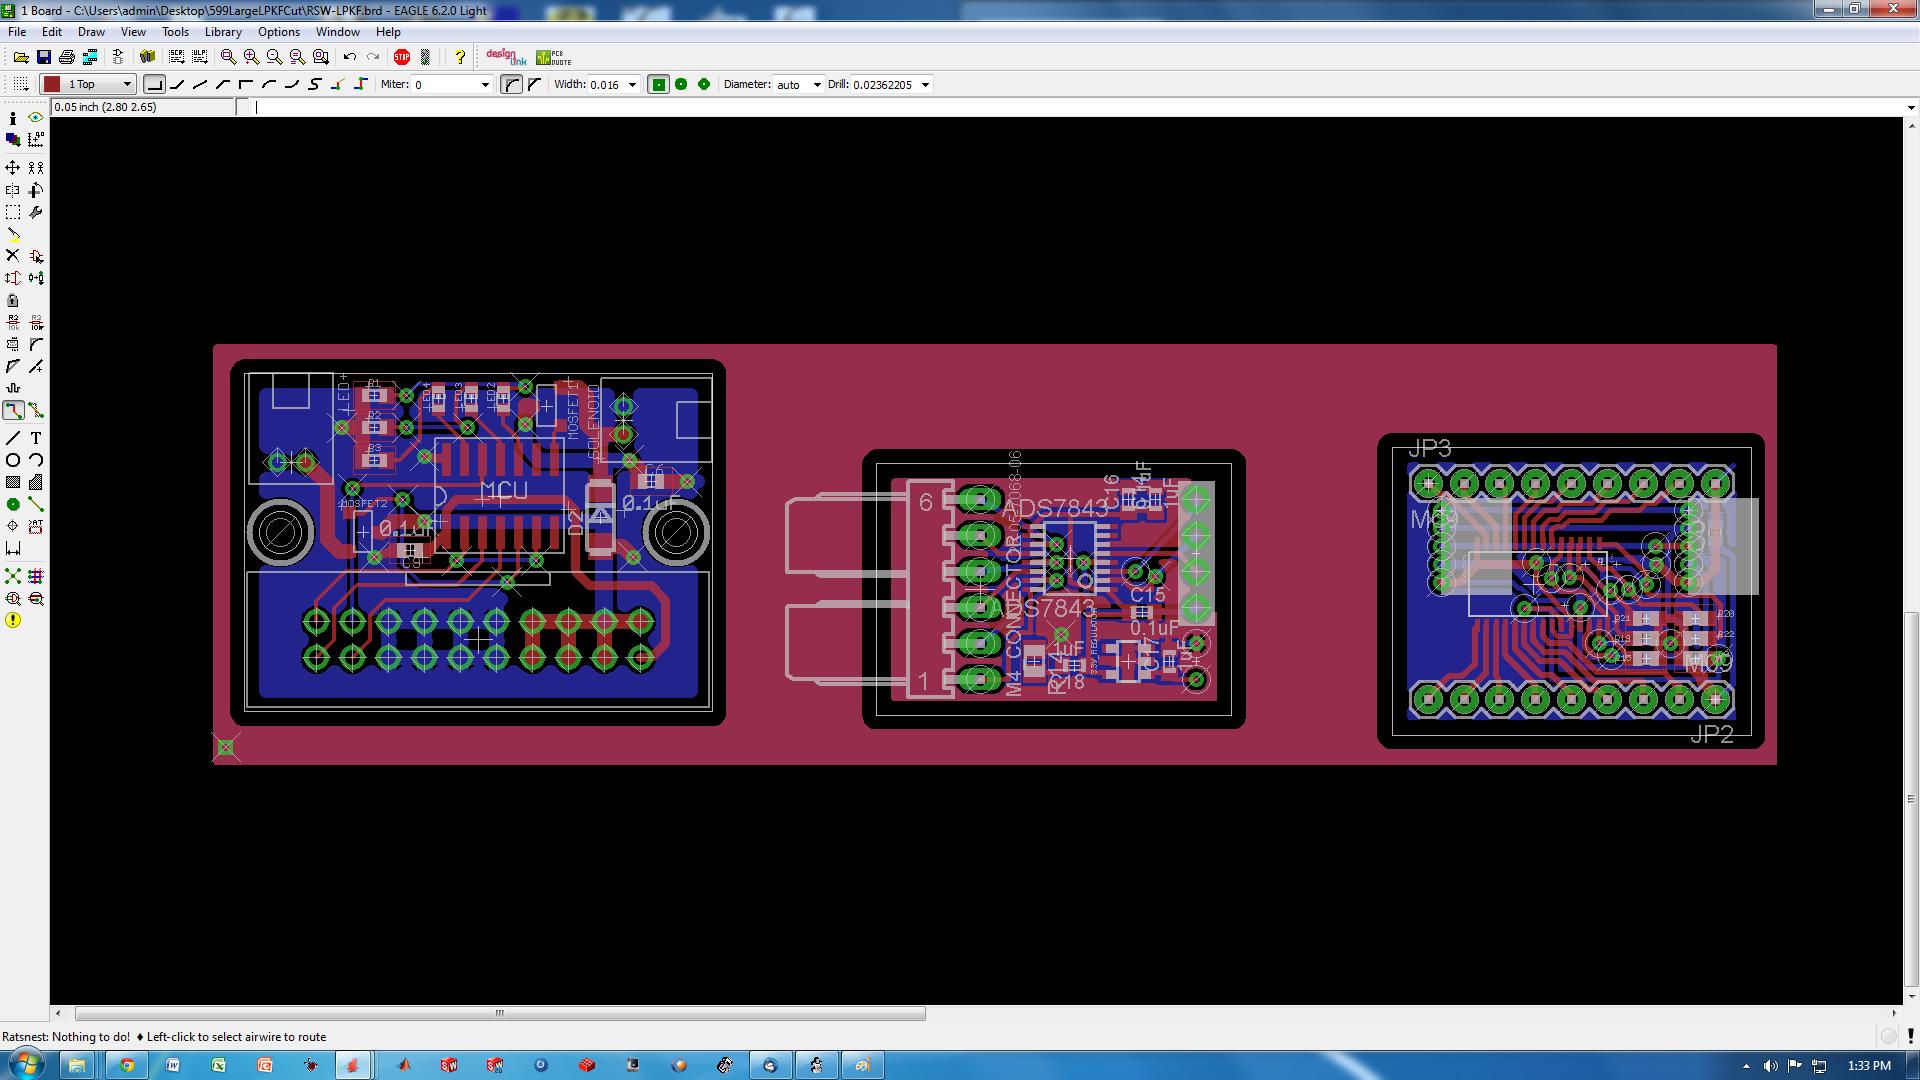 MEAM.Design : MAEVARM : Preparing an Eagle Board File for the S62